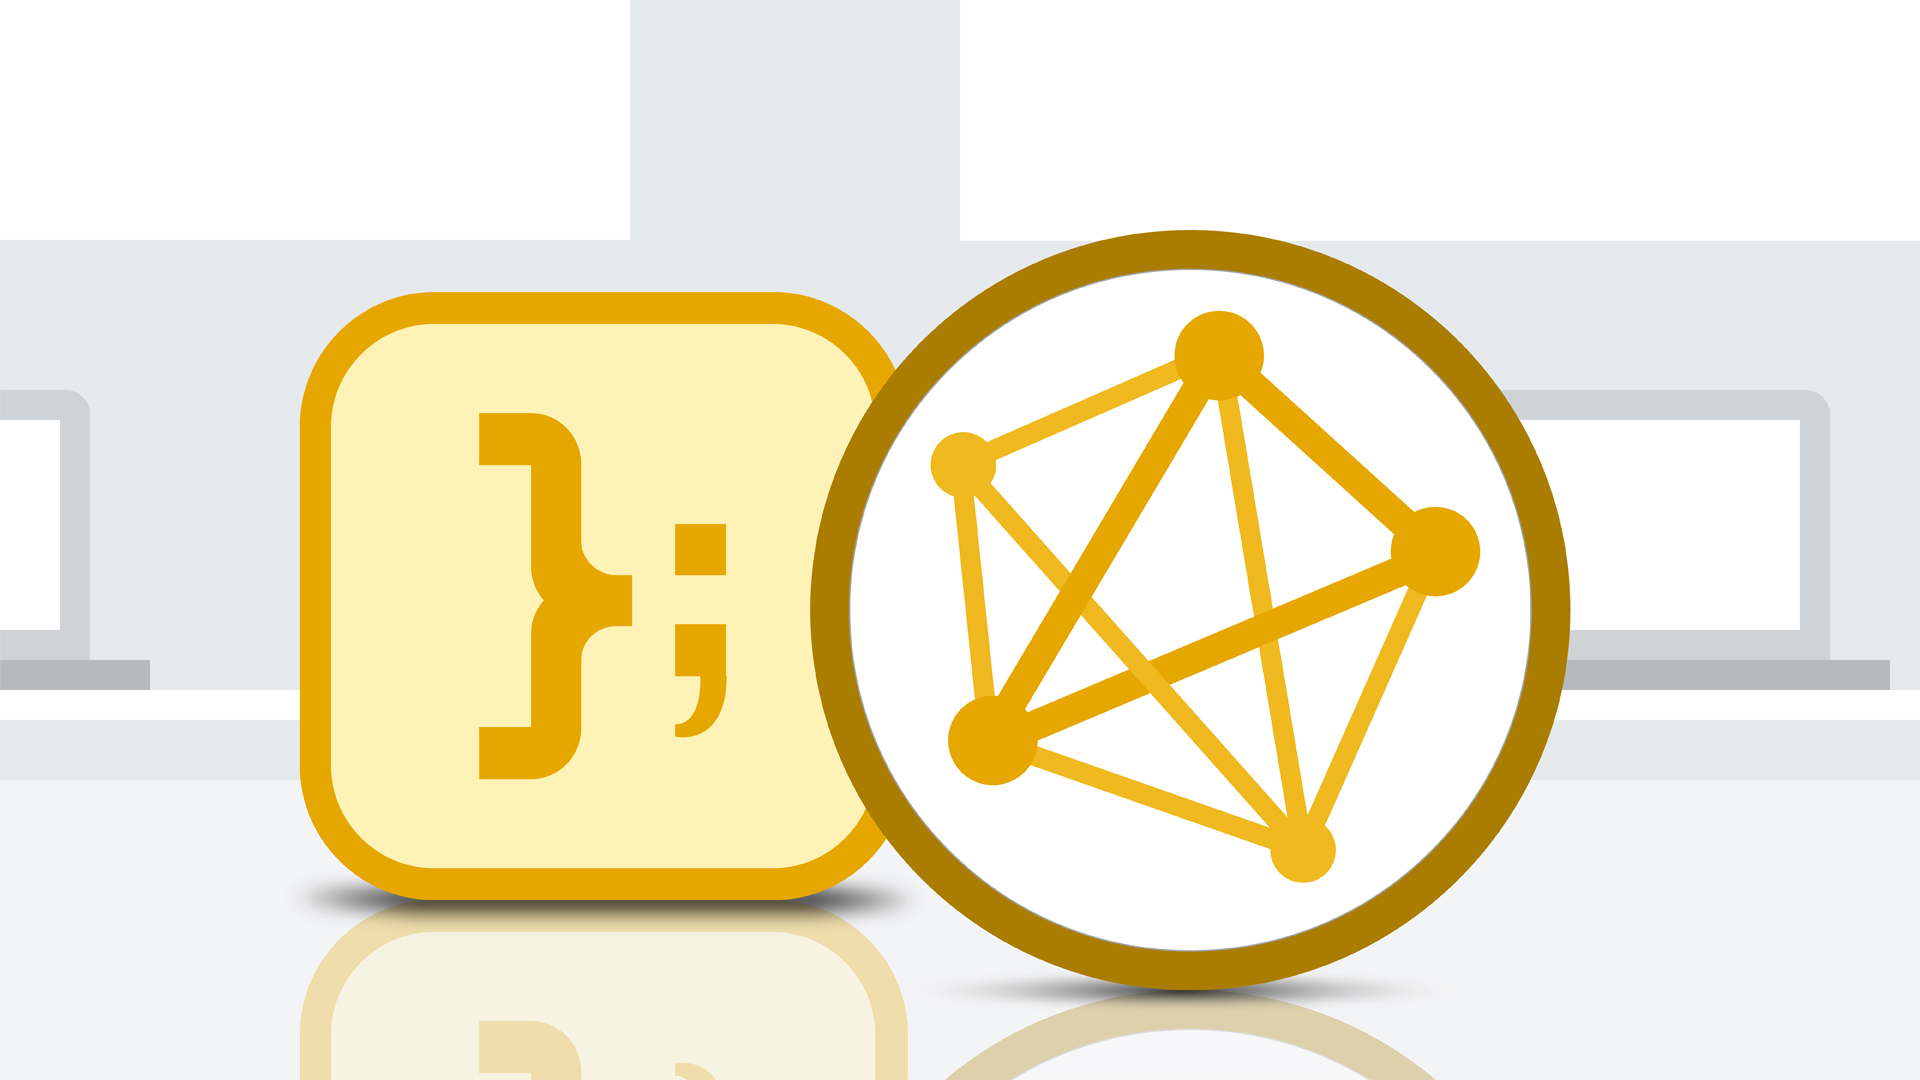 Drawing Lines Javafx : Learning javafx gui development